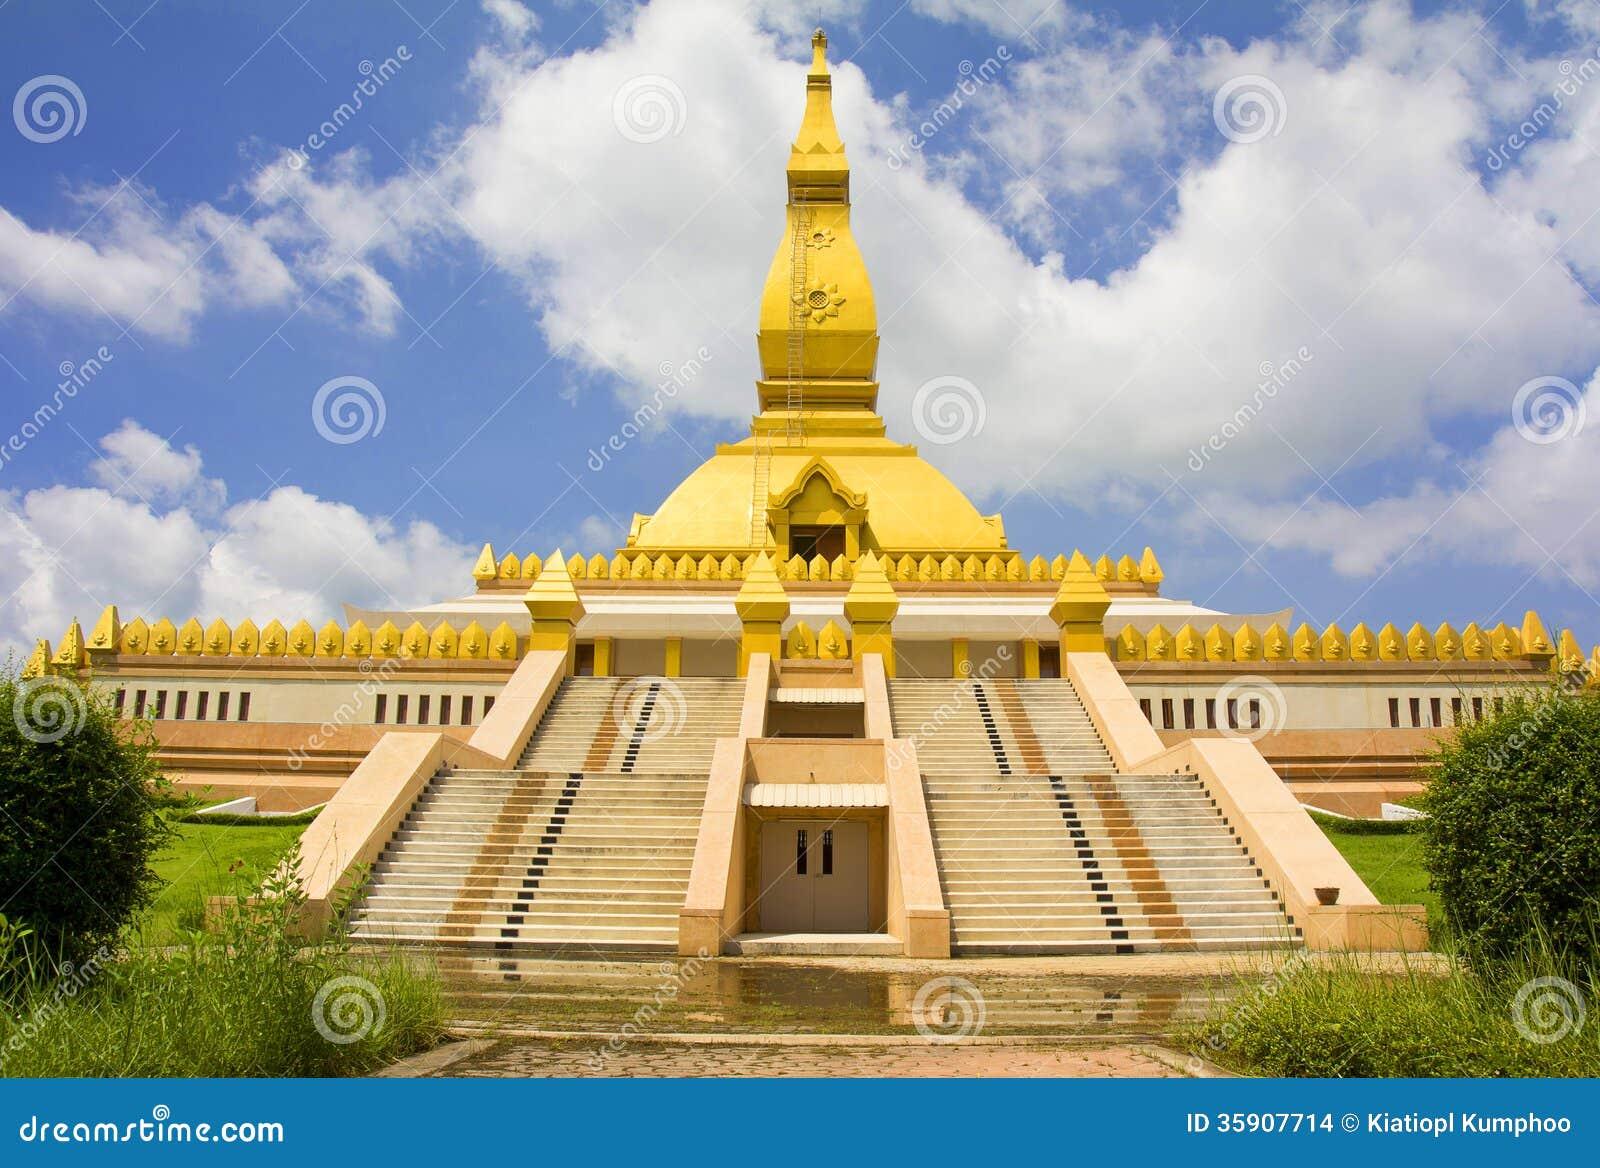 Roi Et Thailand  city images : Pagoda Mahabua, Roi Et, Thailand Stock Images Image: 35907714